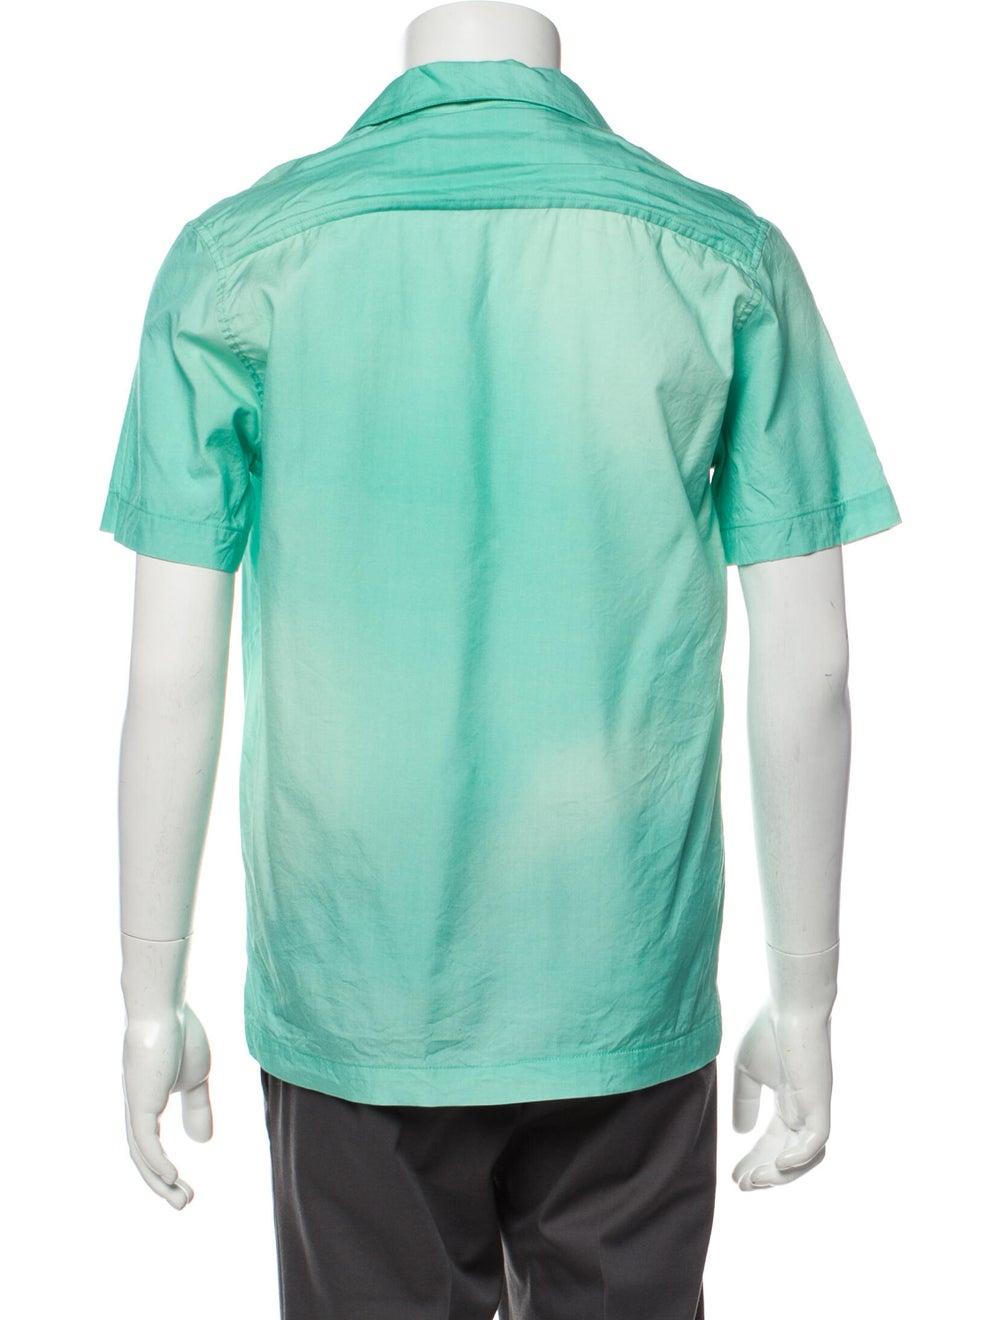 Goodfight Silk Short Sleeve Shirt Green - image 3